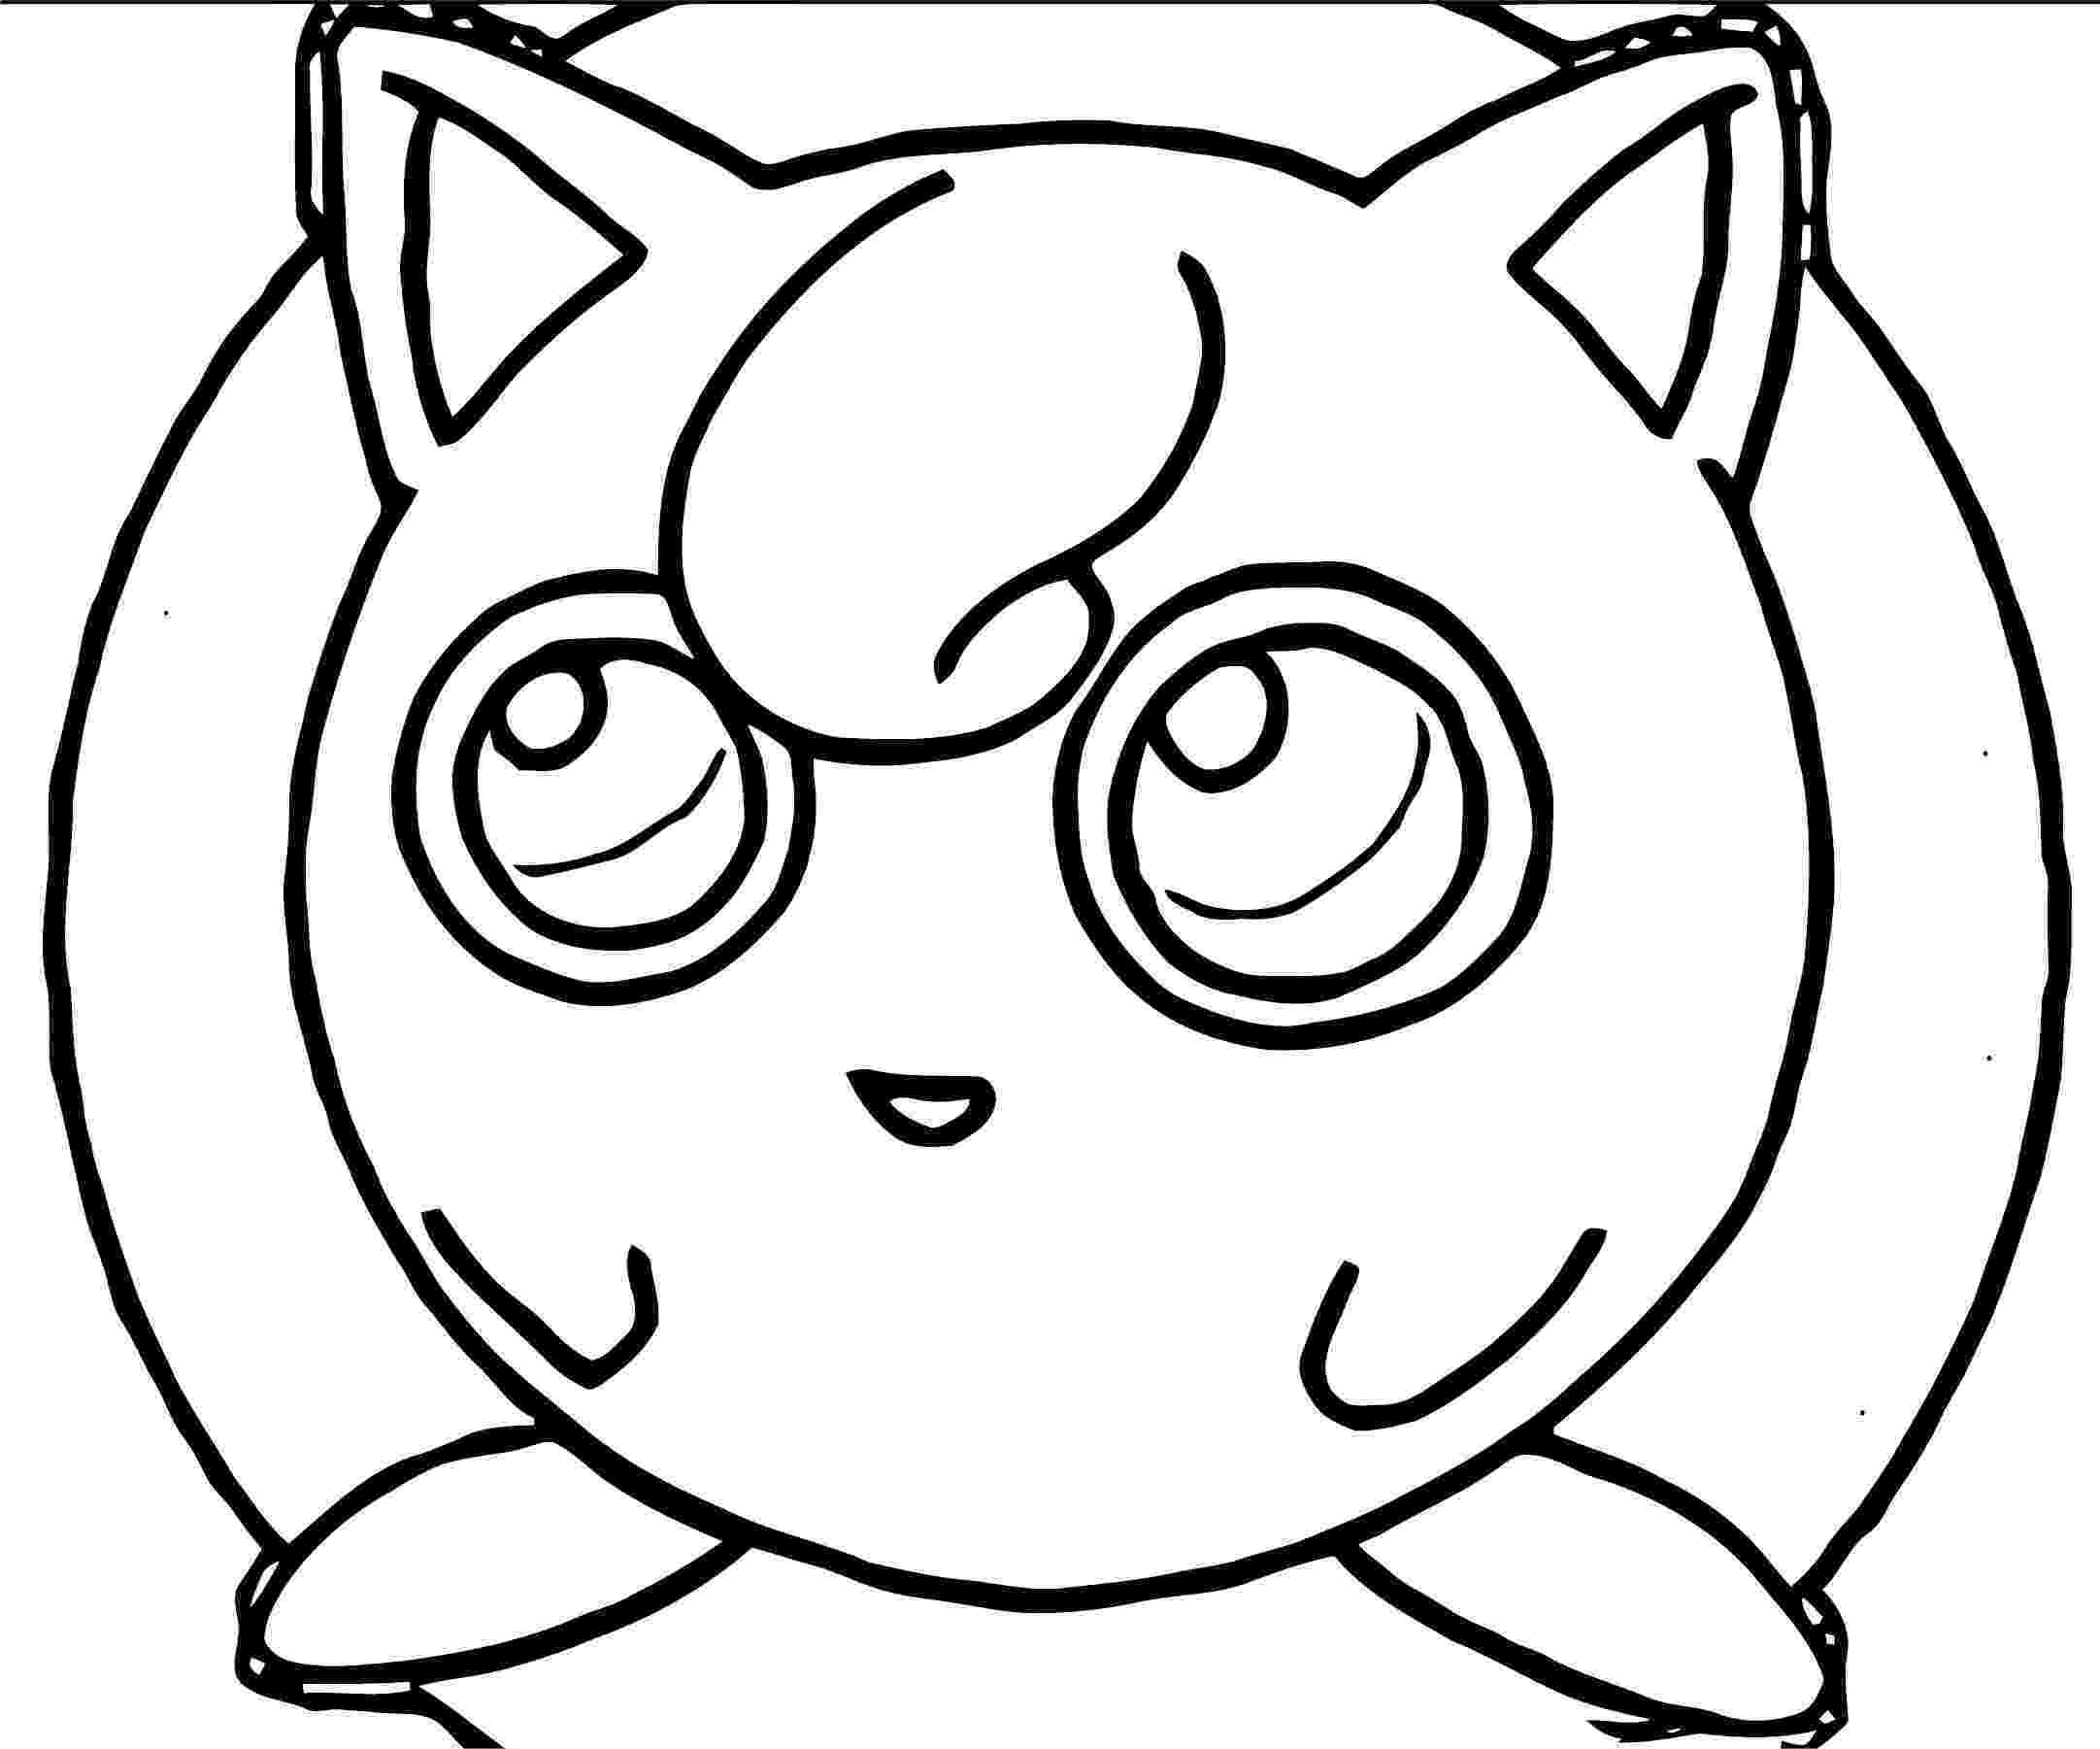 jigglypuff coloring pages jigglypuff coloring page wecoloringpage 140 pages coloring jigglypuff